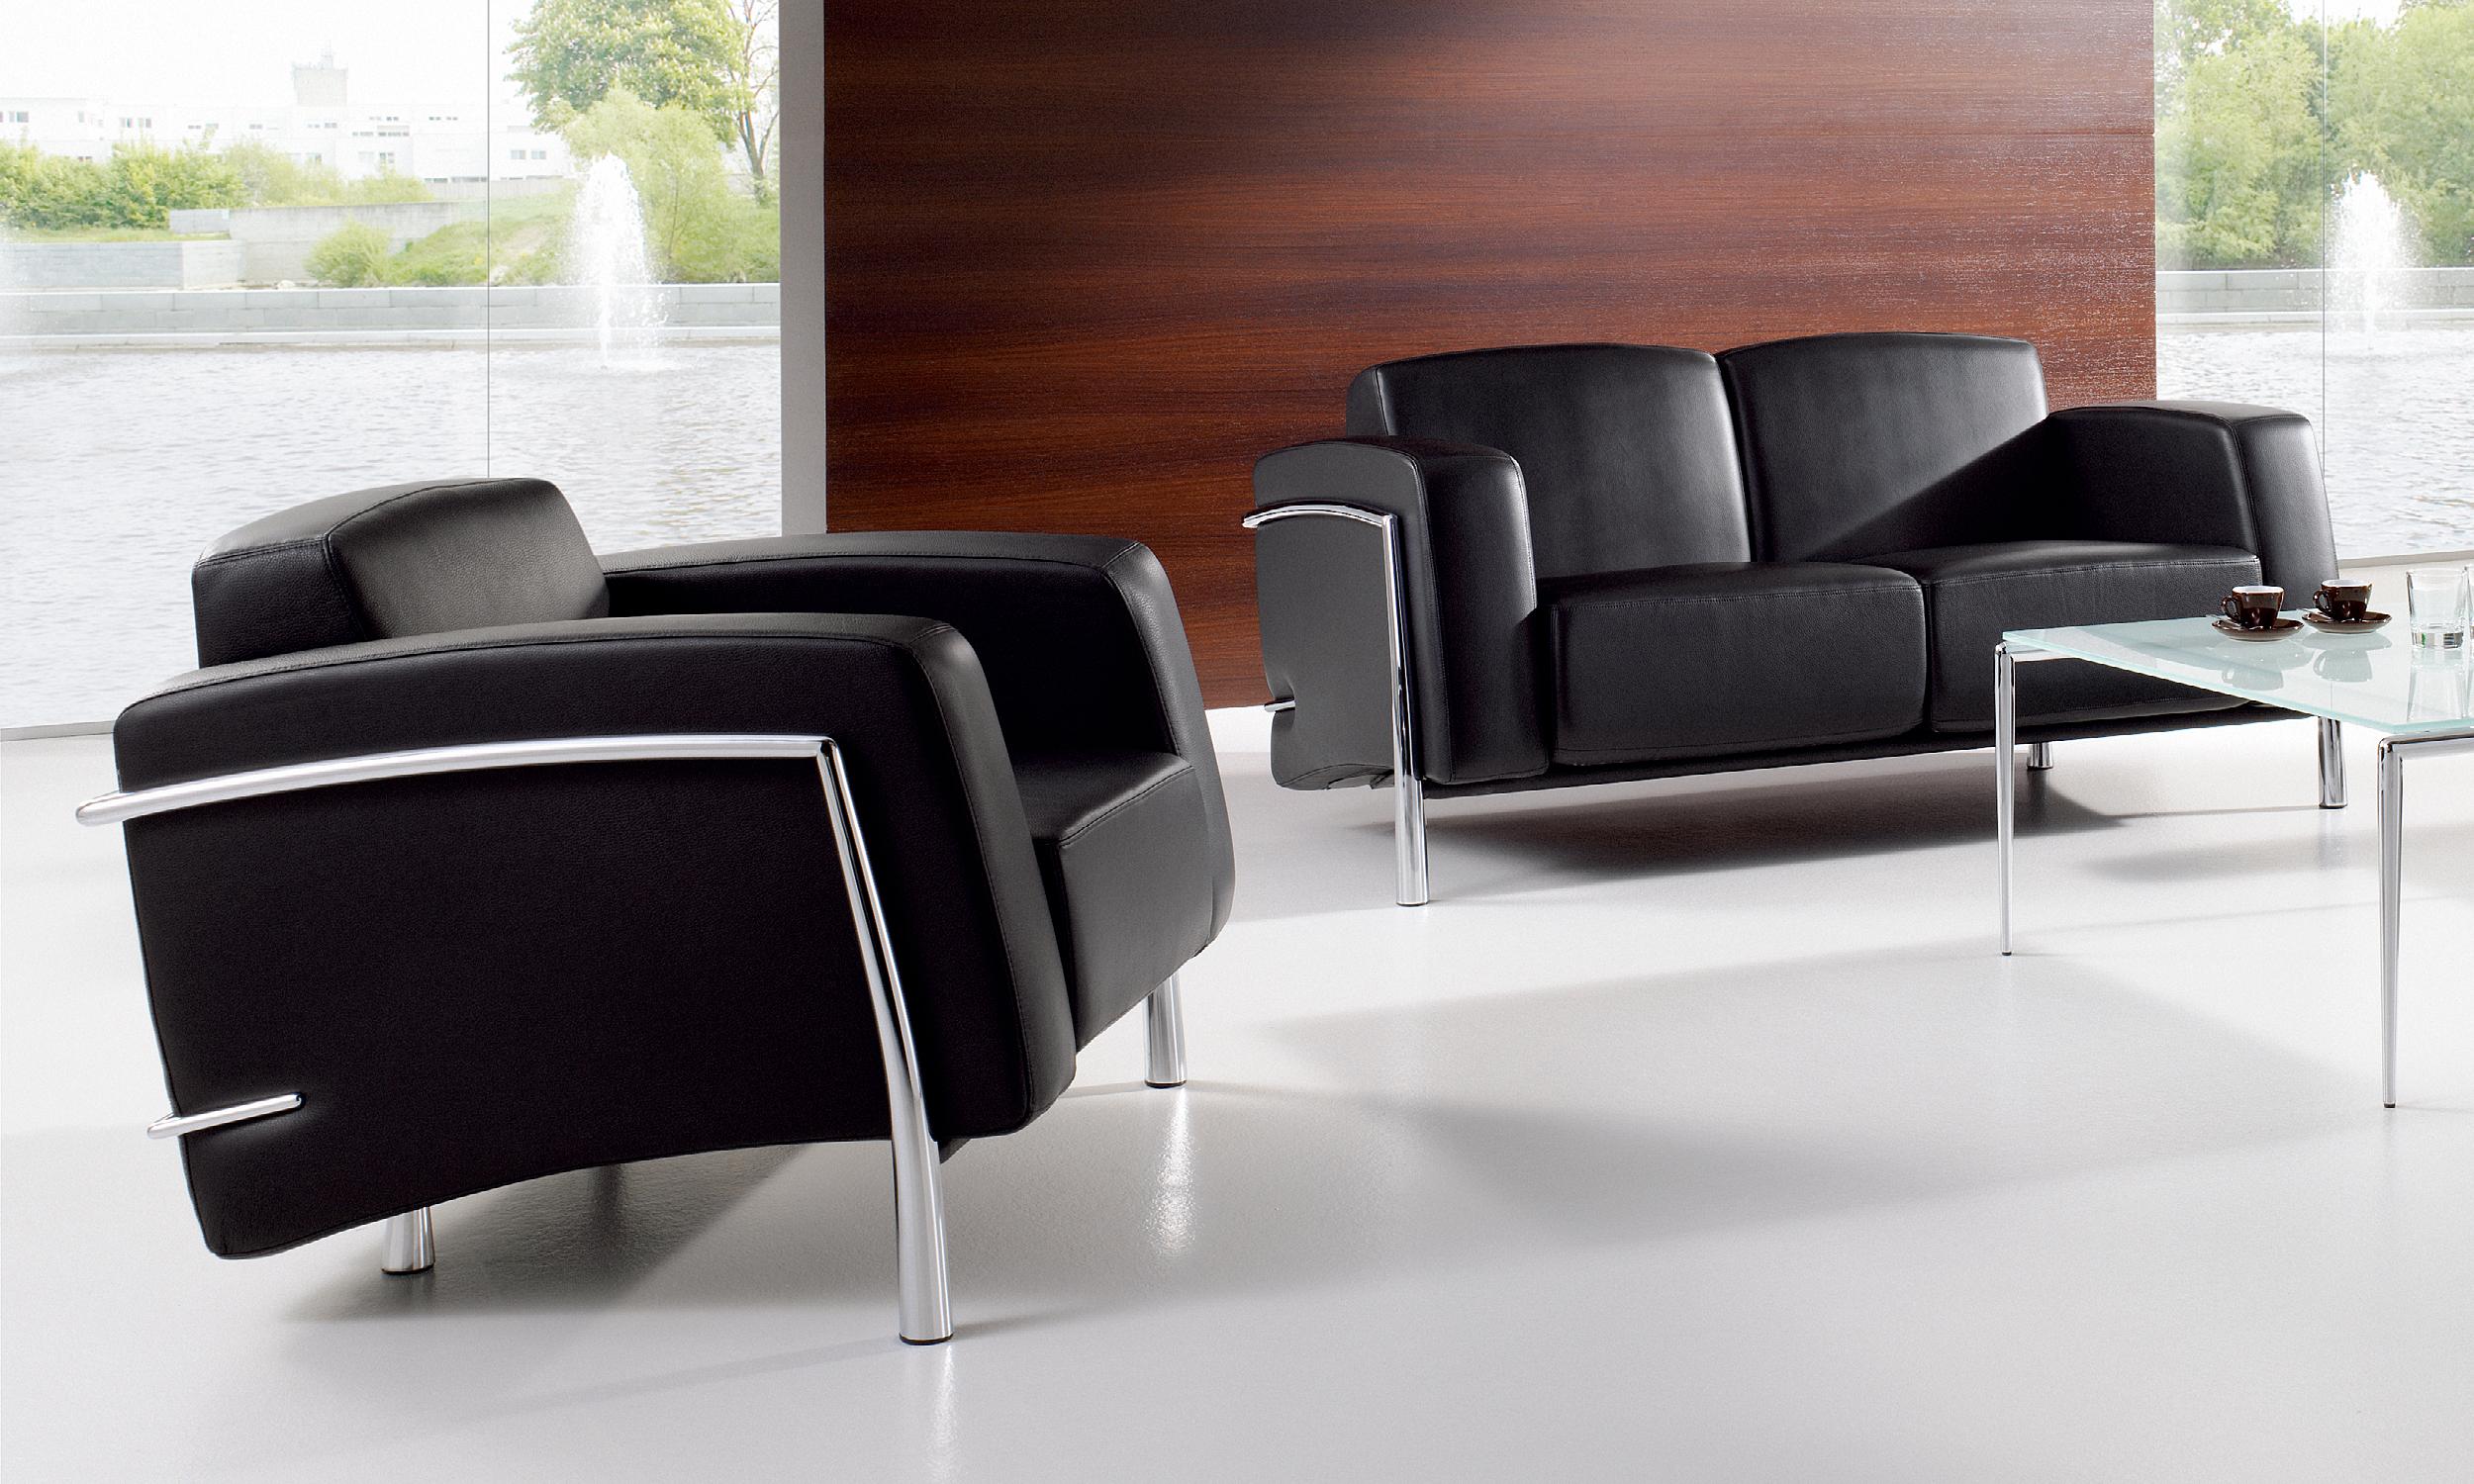 soft-seating_10-6_Classic-2.jpg